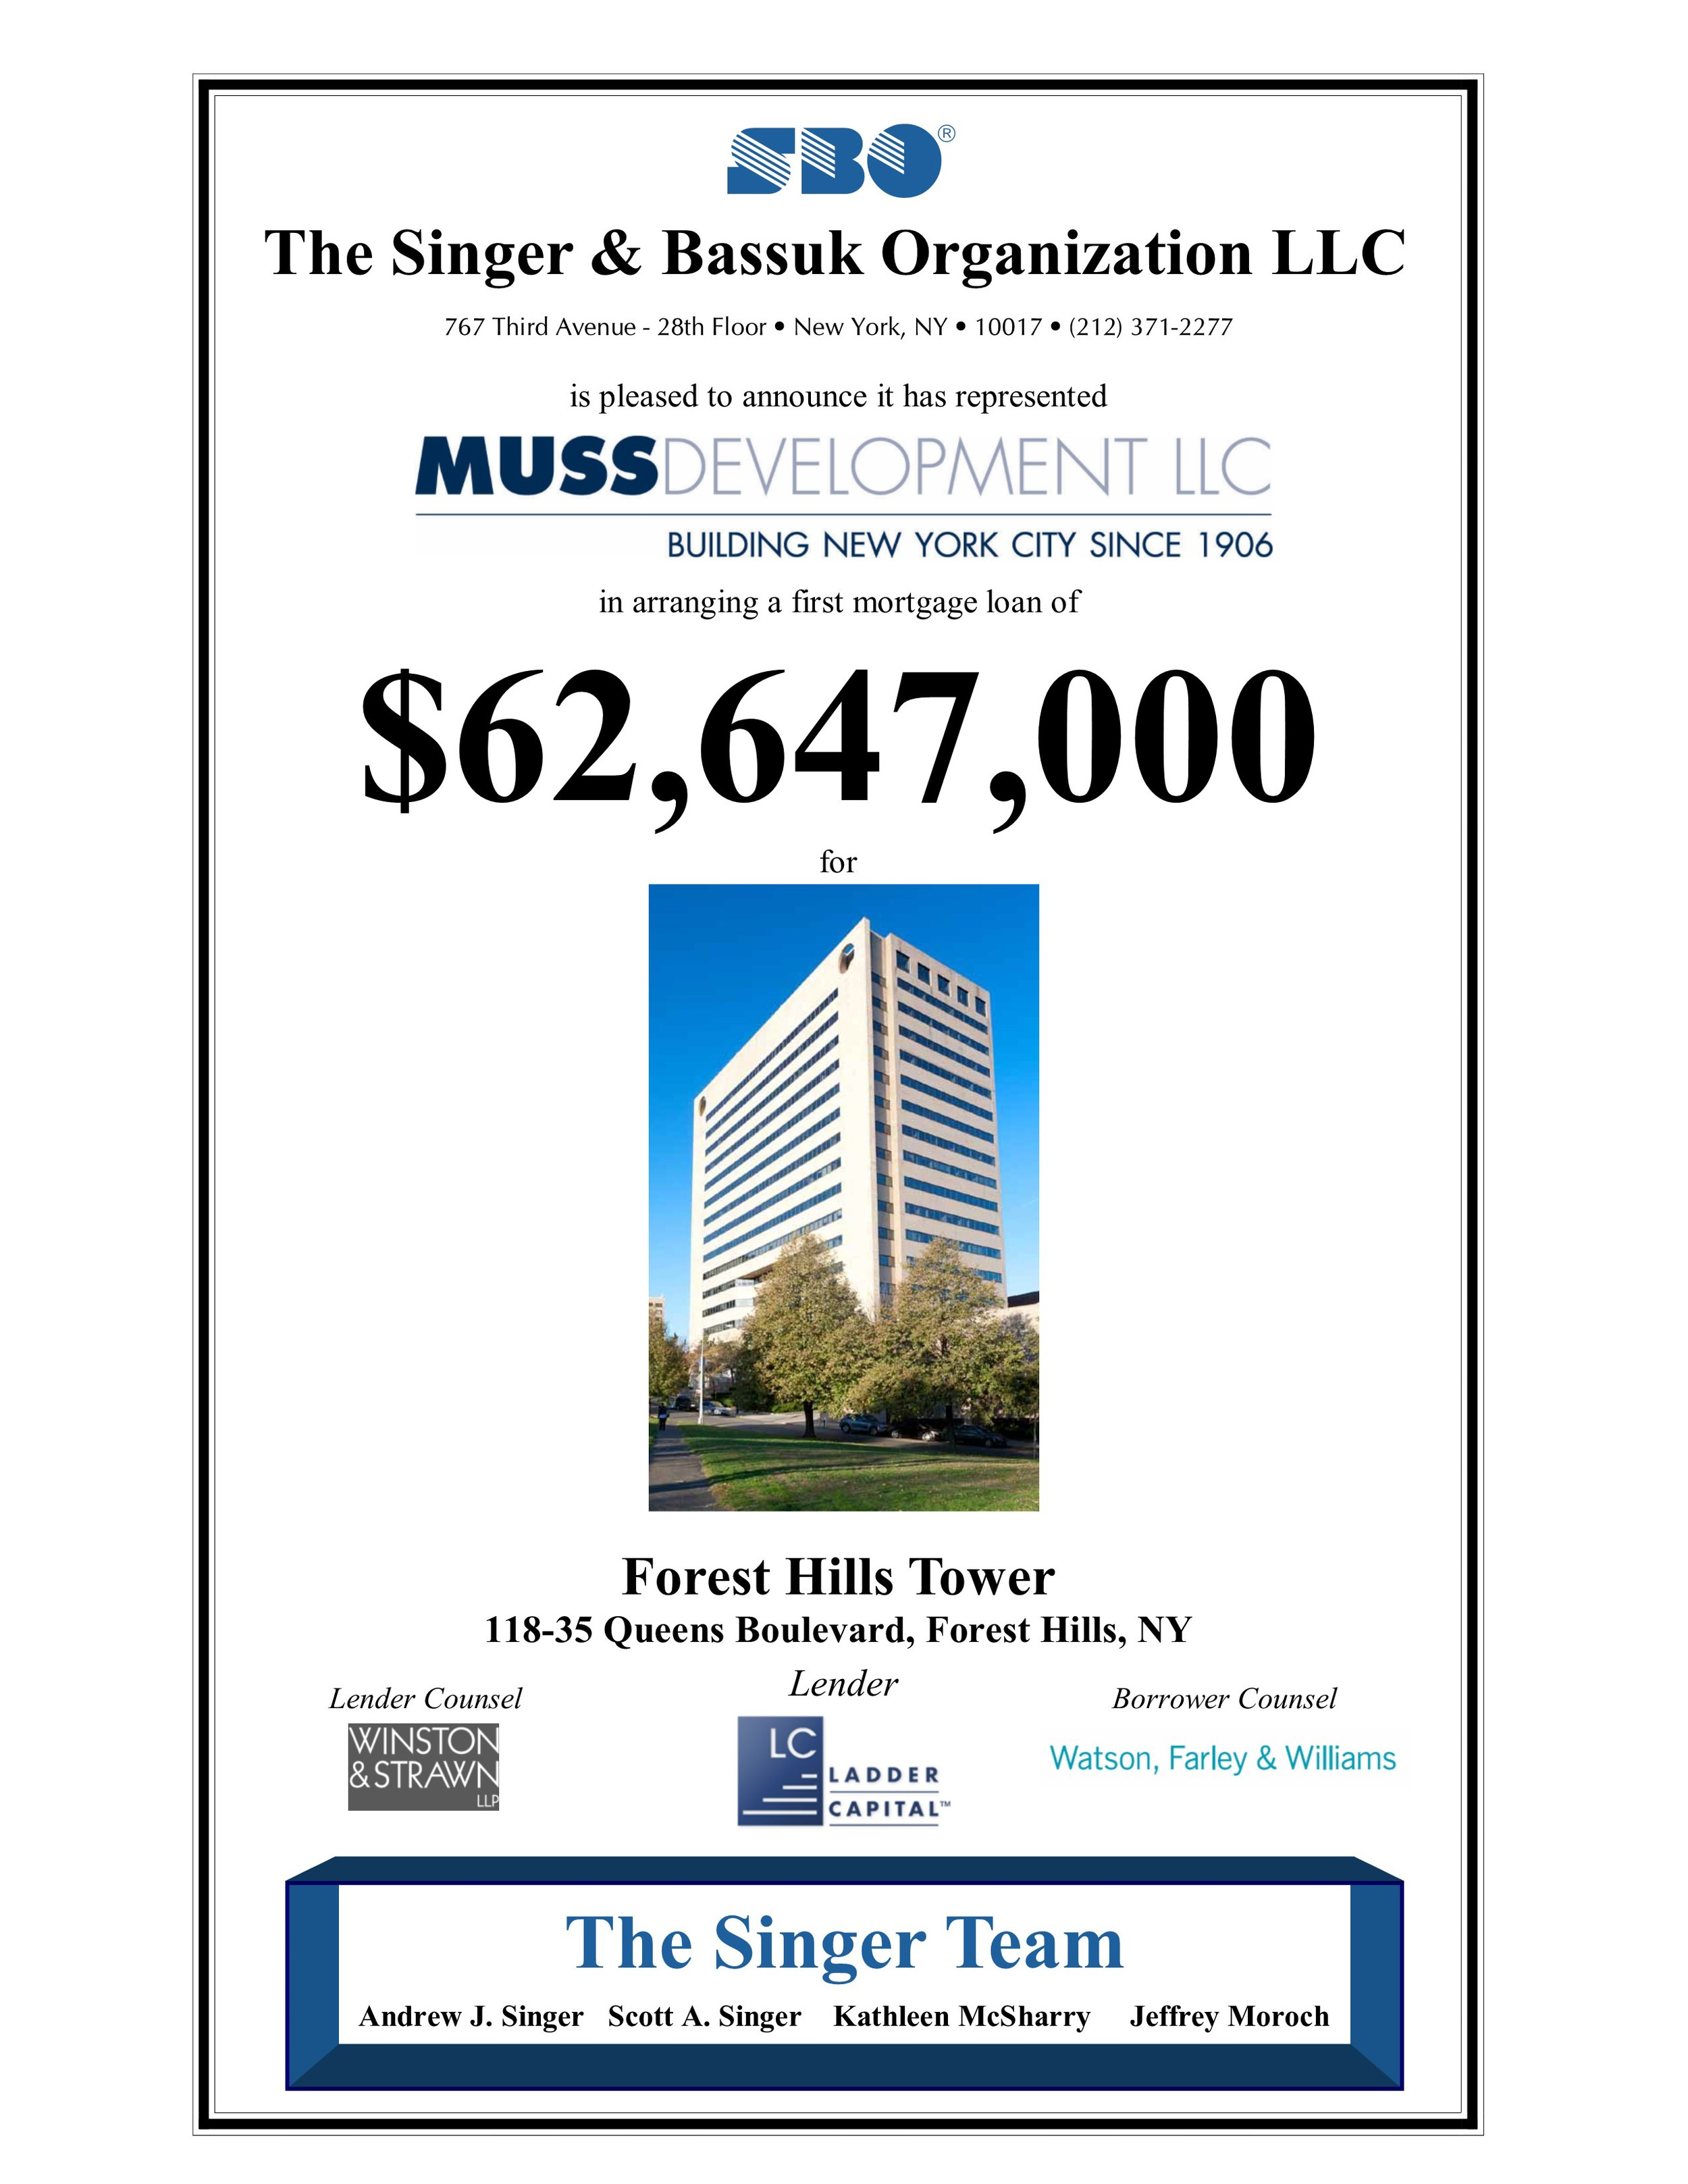 Forest Hills Tower - lucite 2 (website).jpg